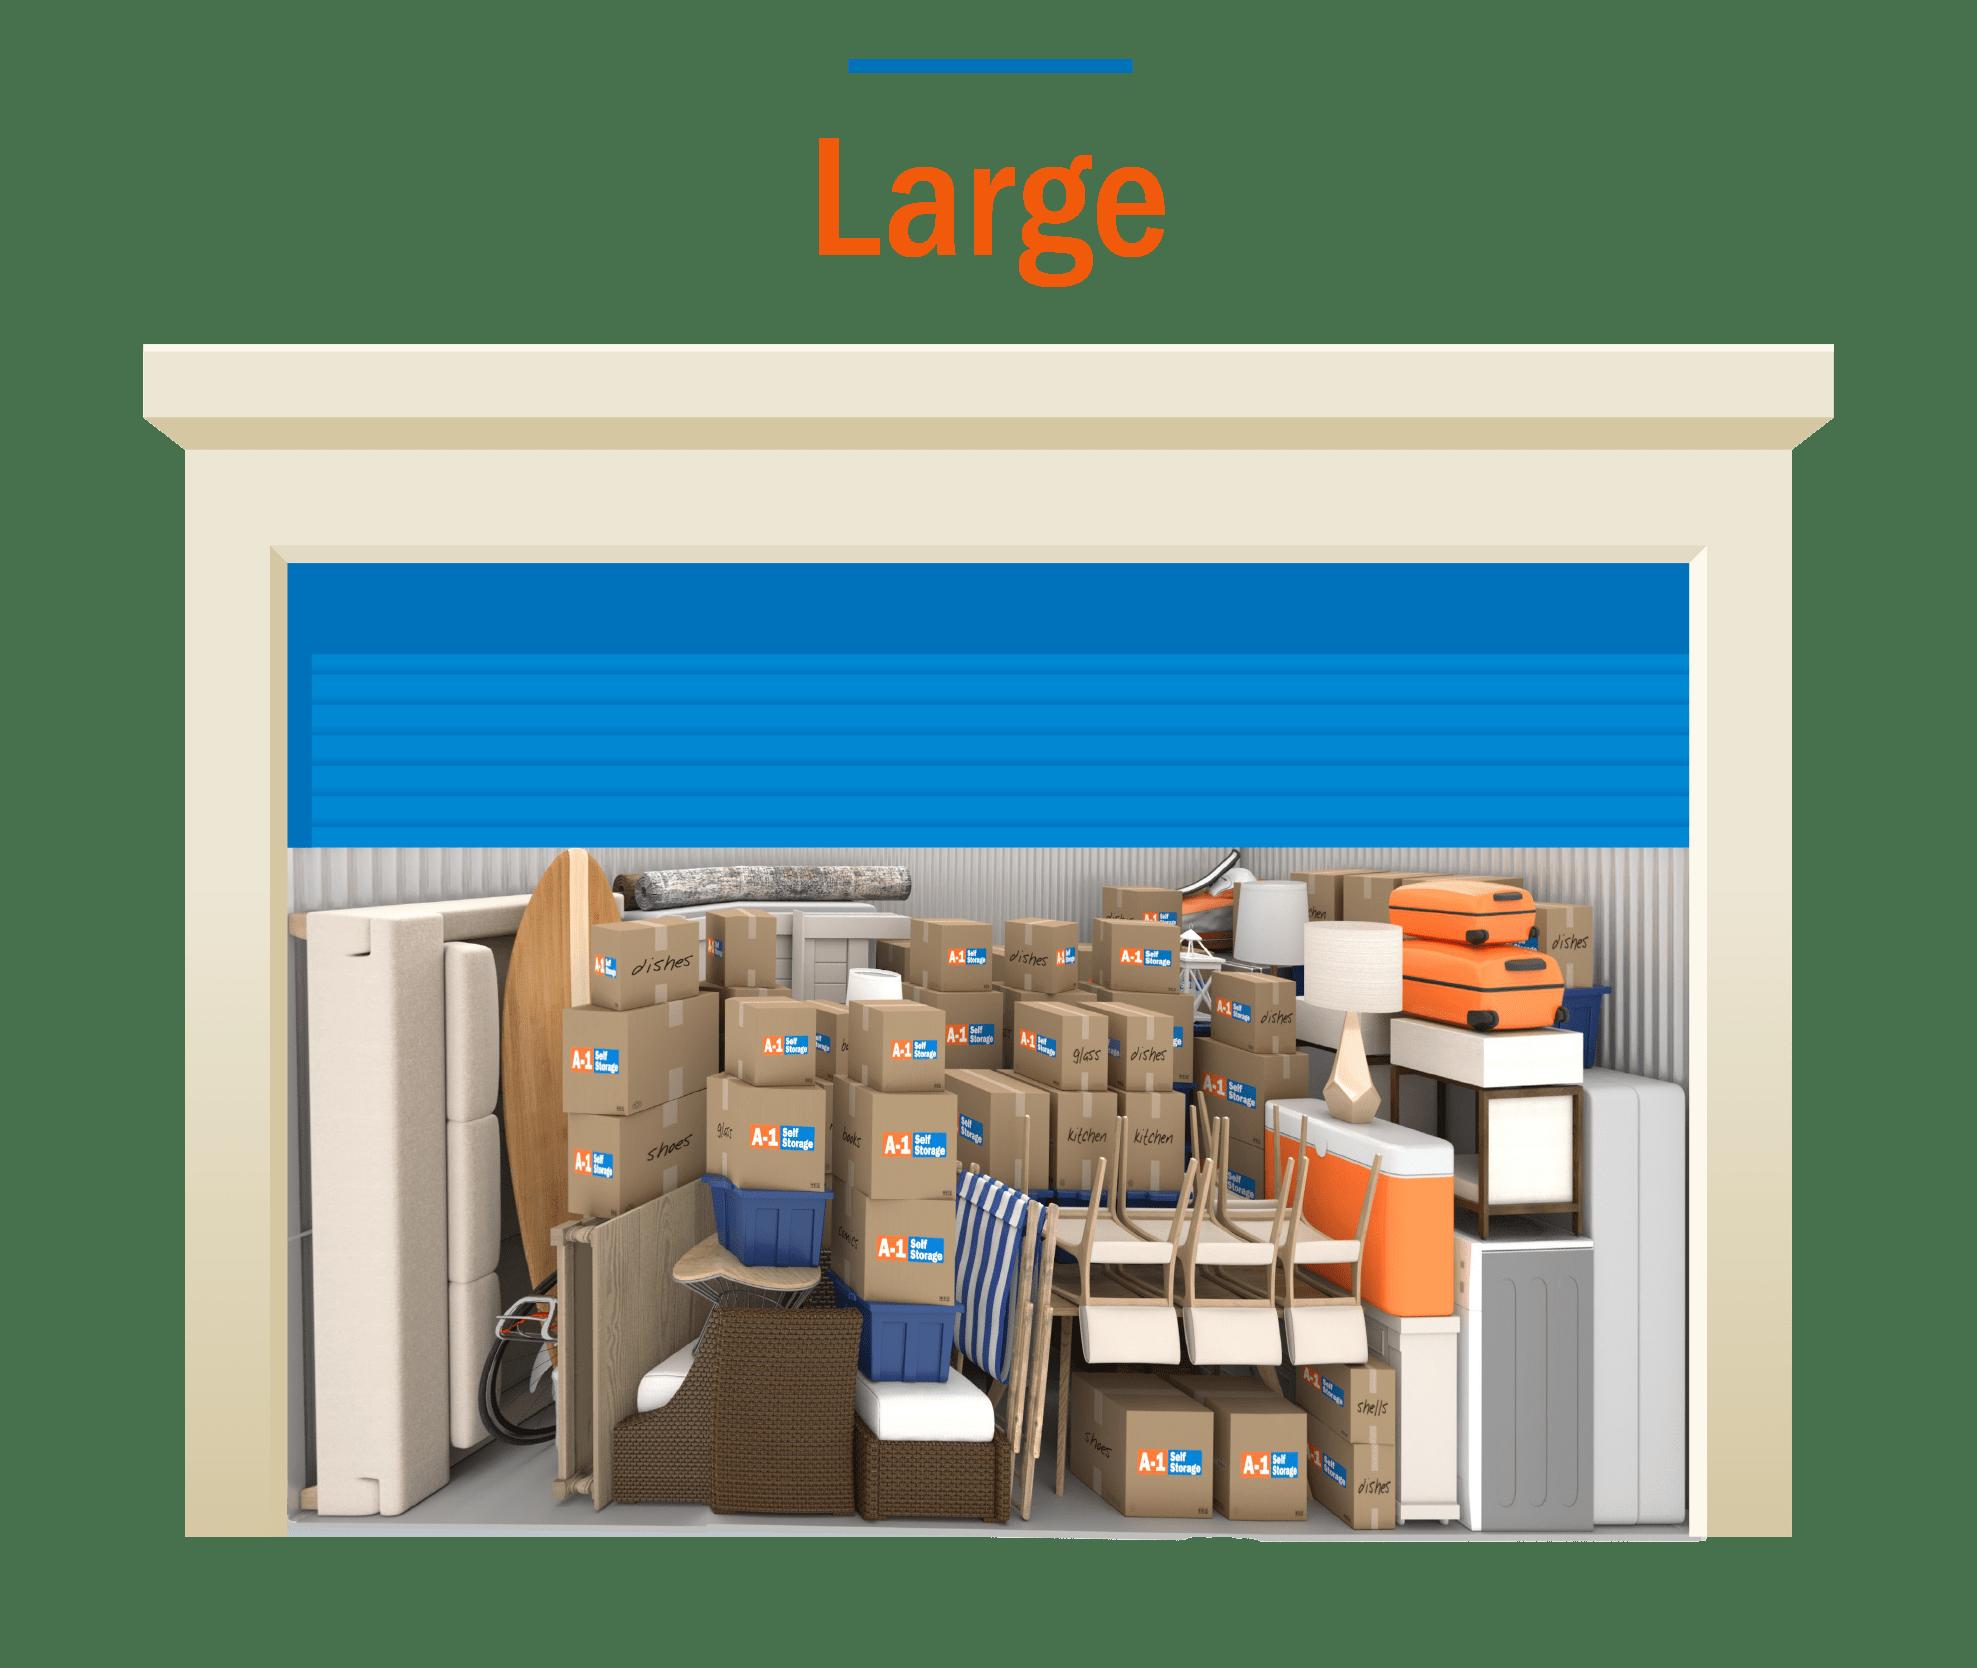 Large storage unit graphic with door open